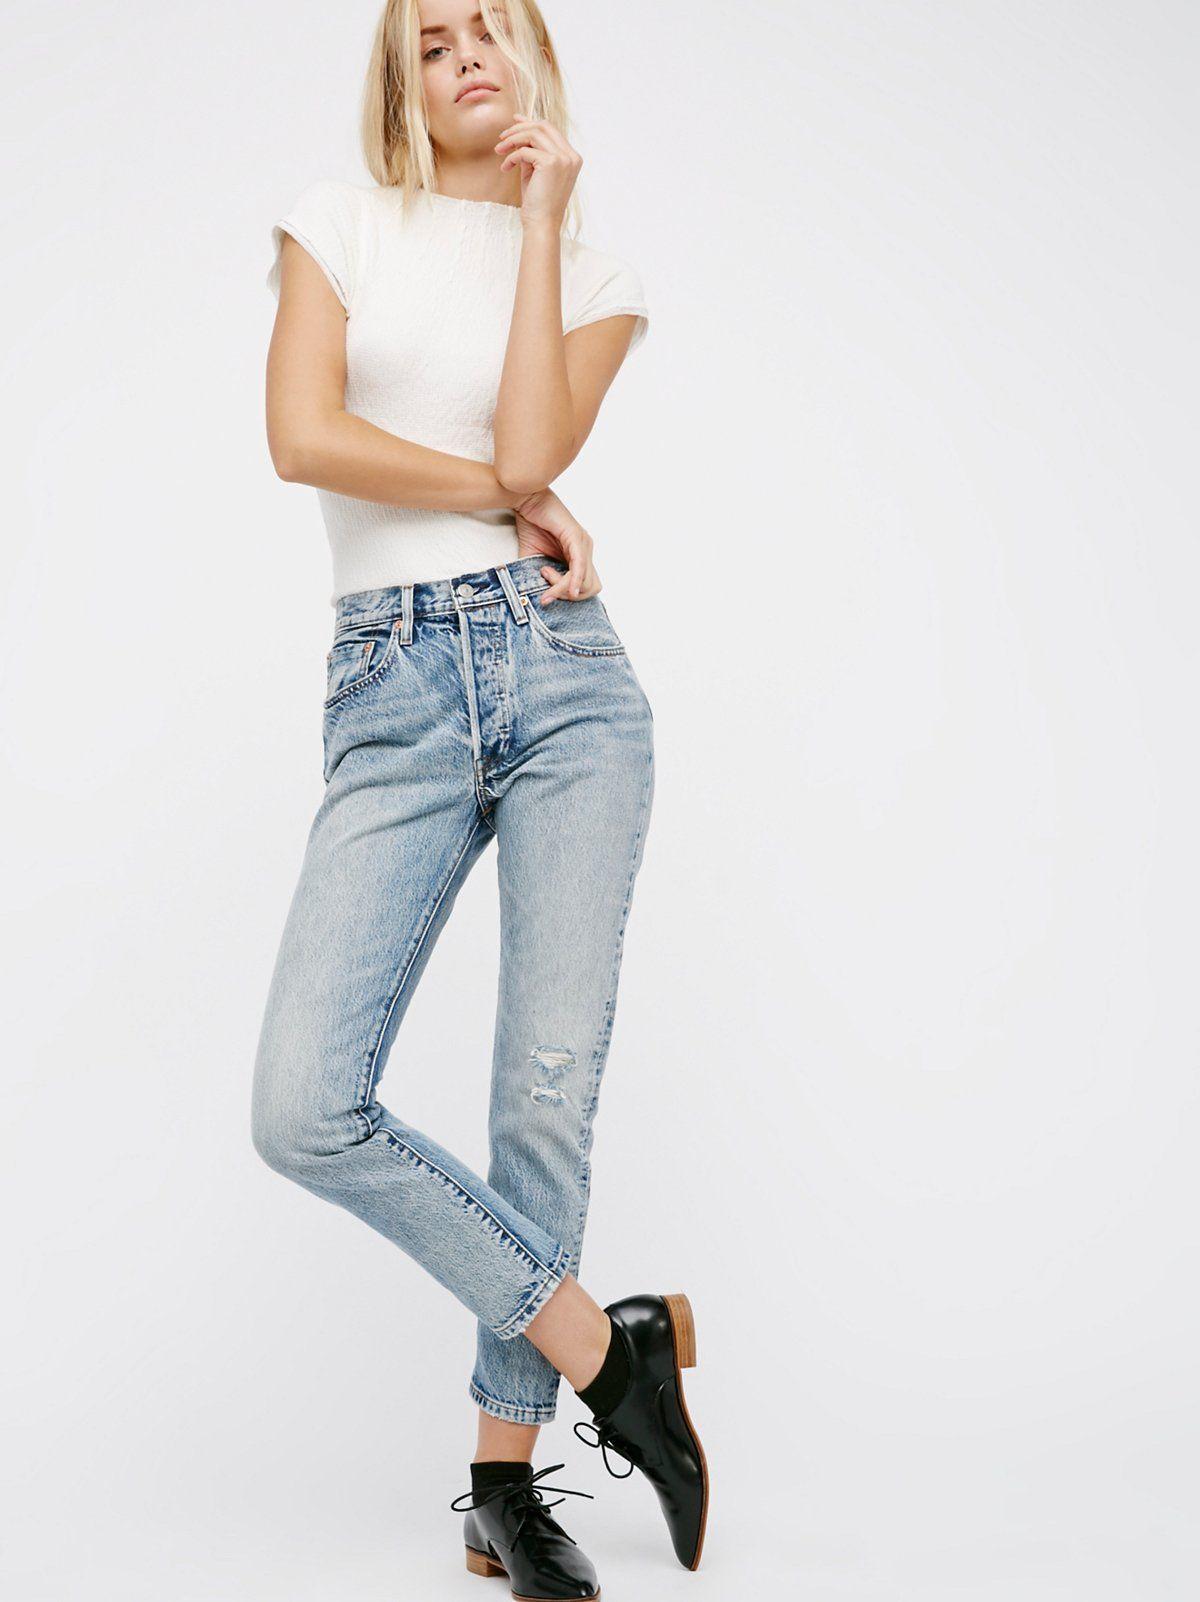 Levi's 501 Skinny Jeans Fashion, Outfits, Mom jeans